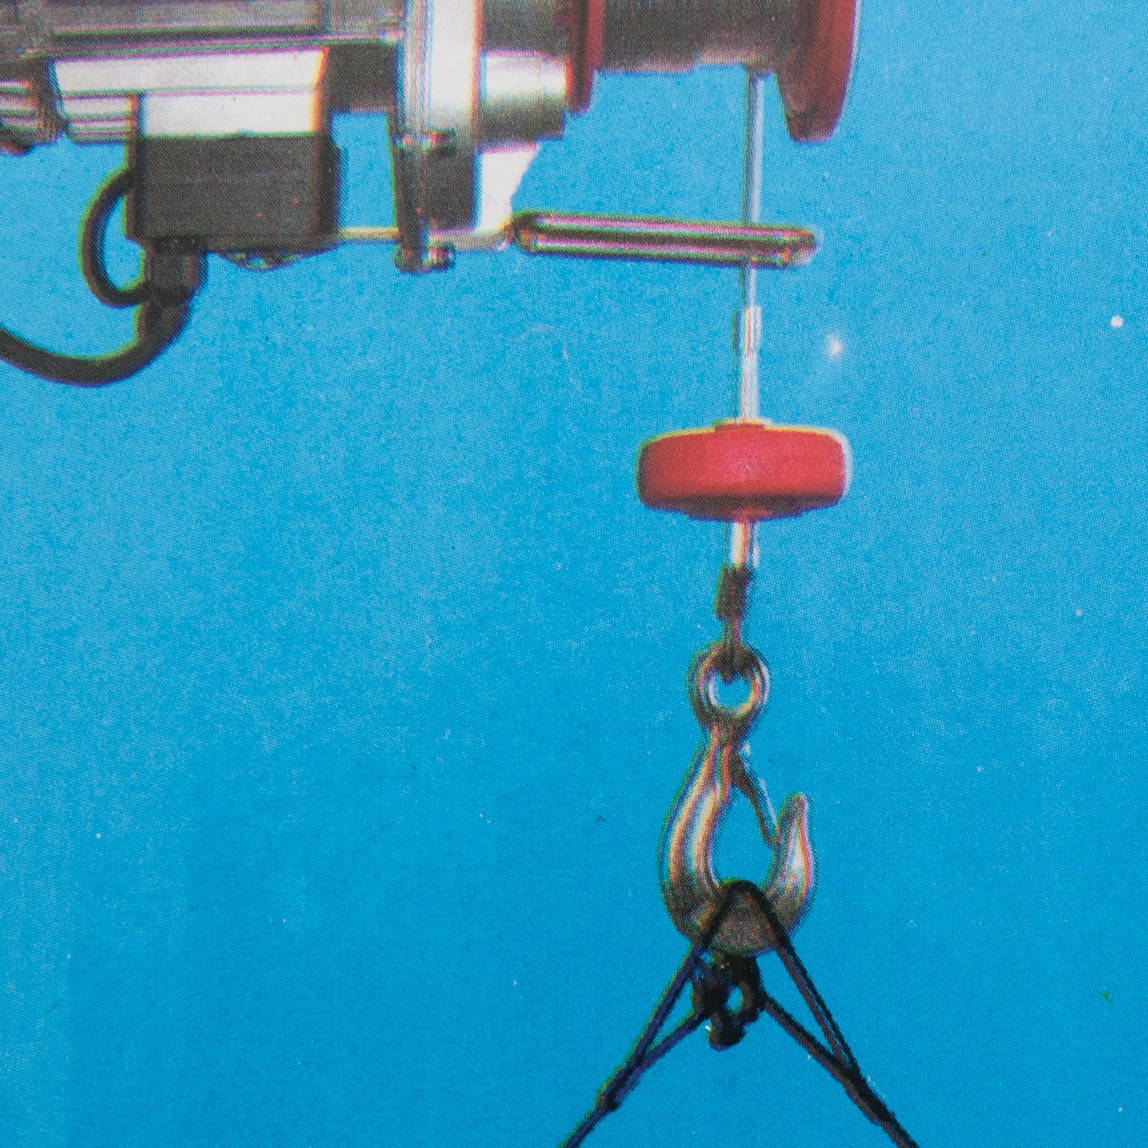 Biglift  MAXVINC 500/1000 Kg 20mElektrikli Vinç